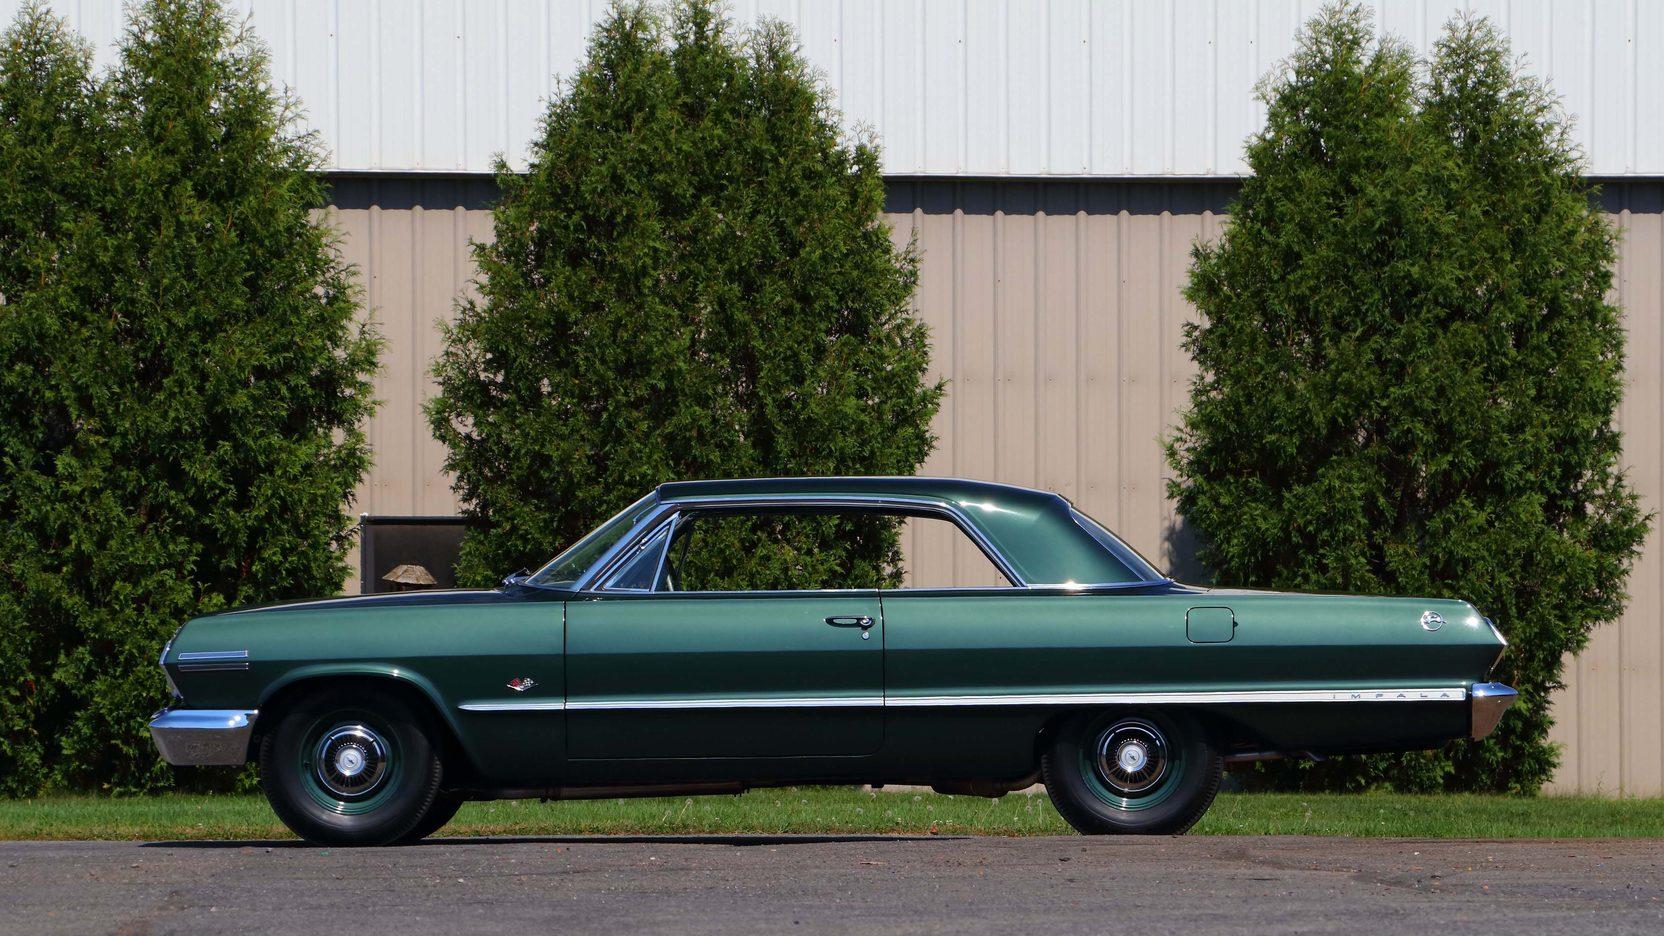 1963 Chevrolet Impala side profile